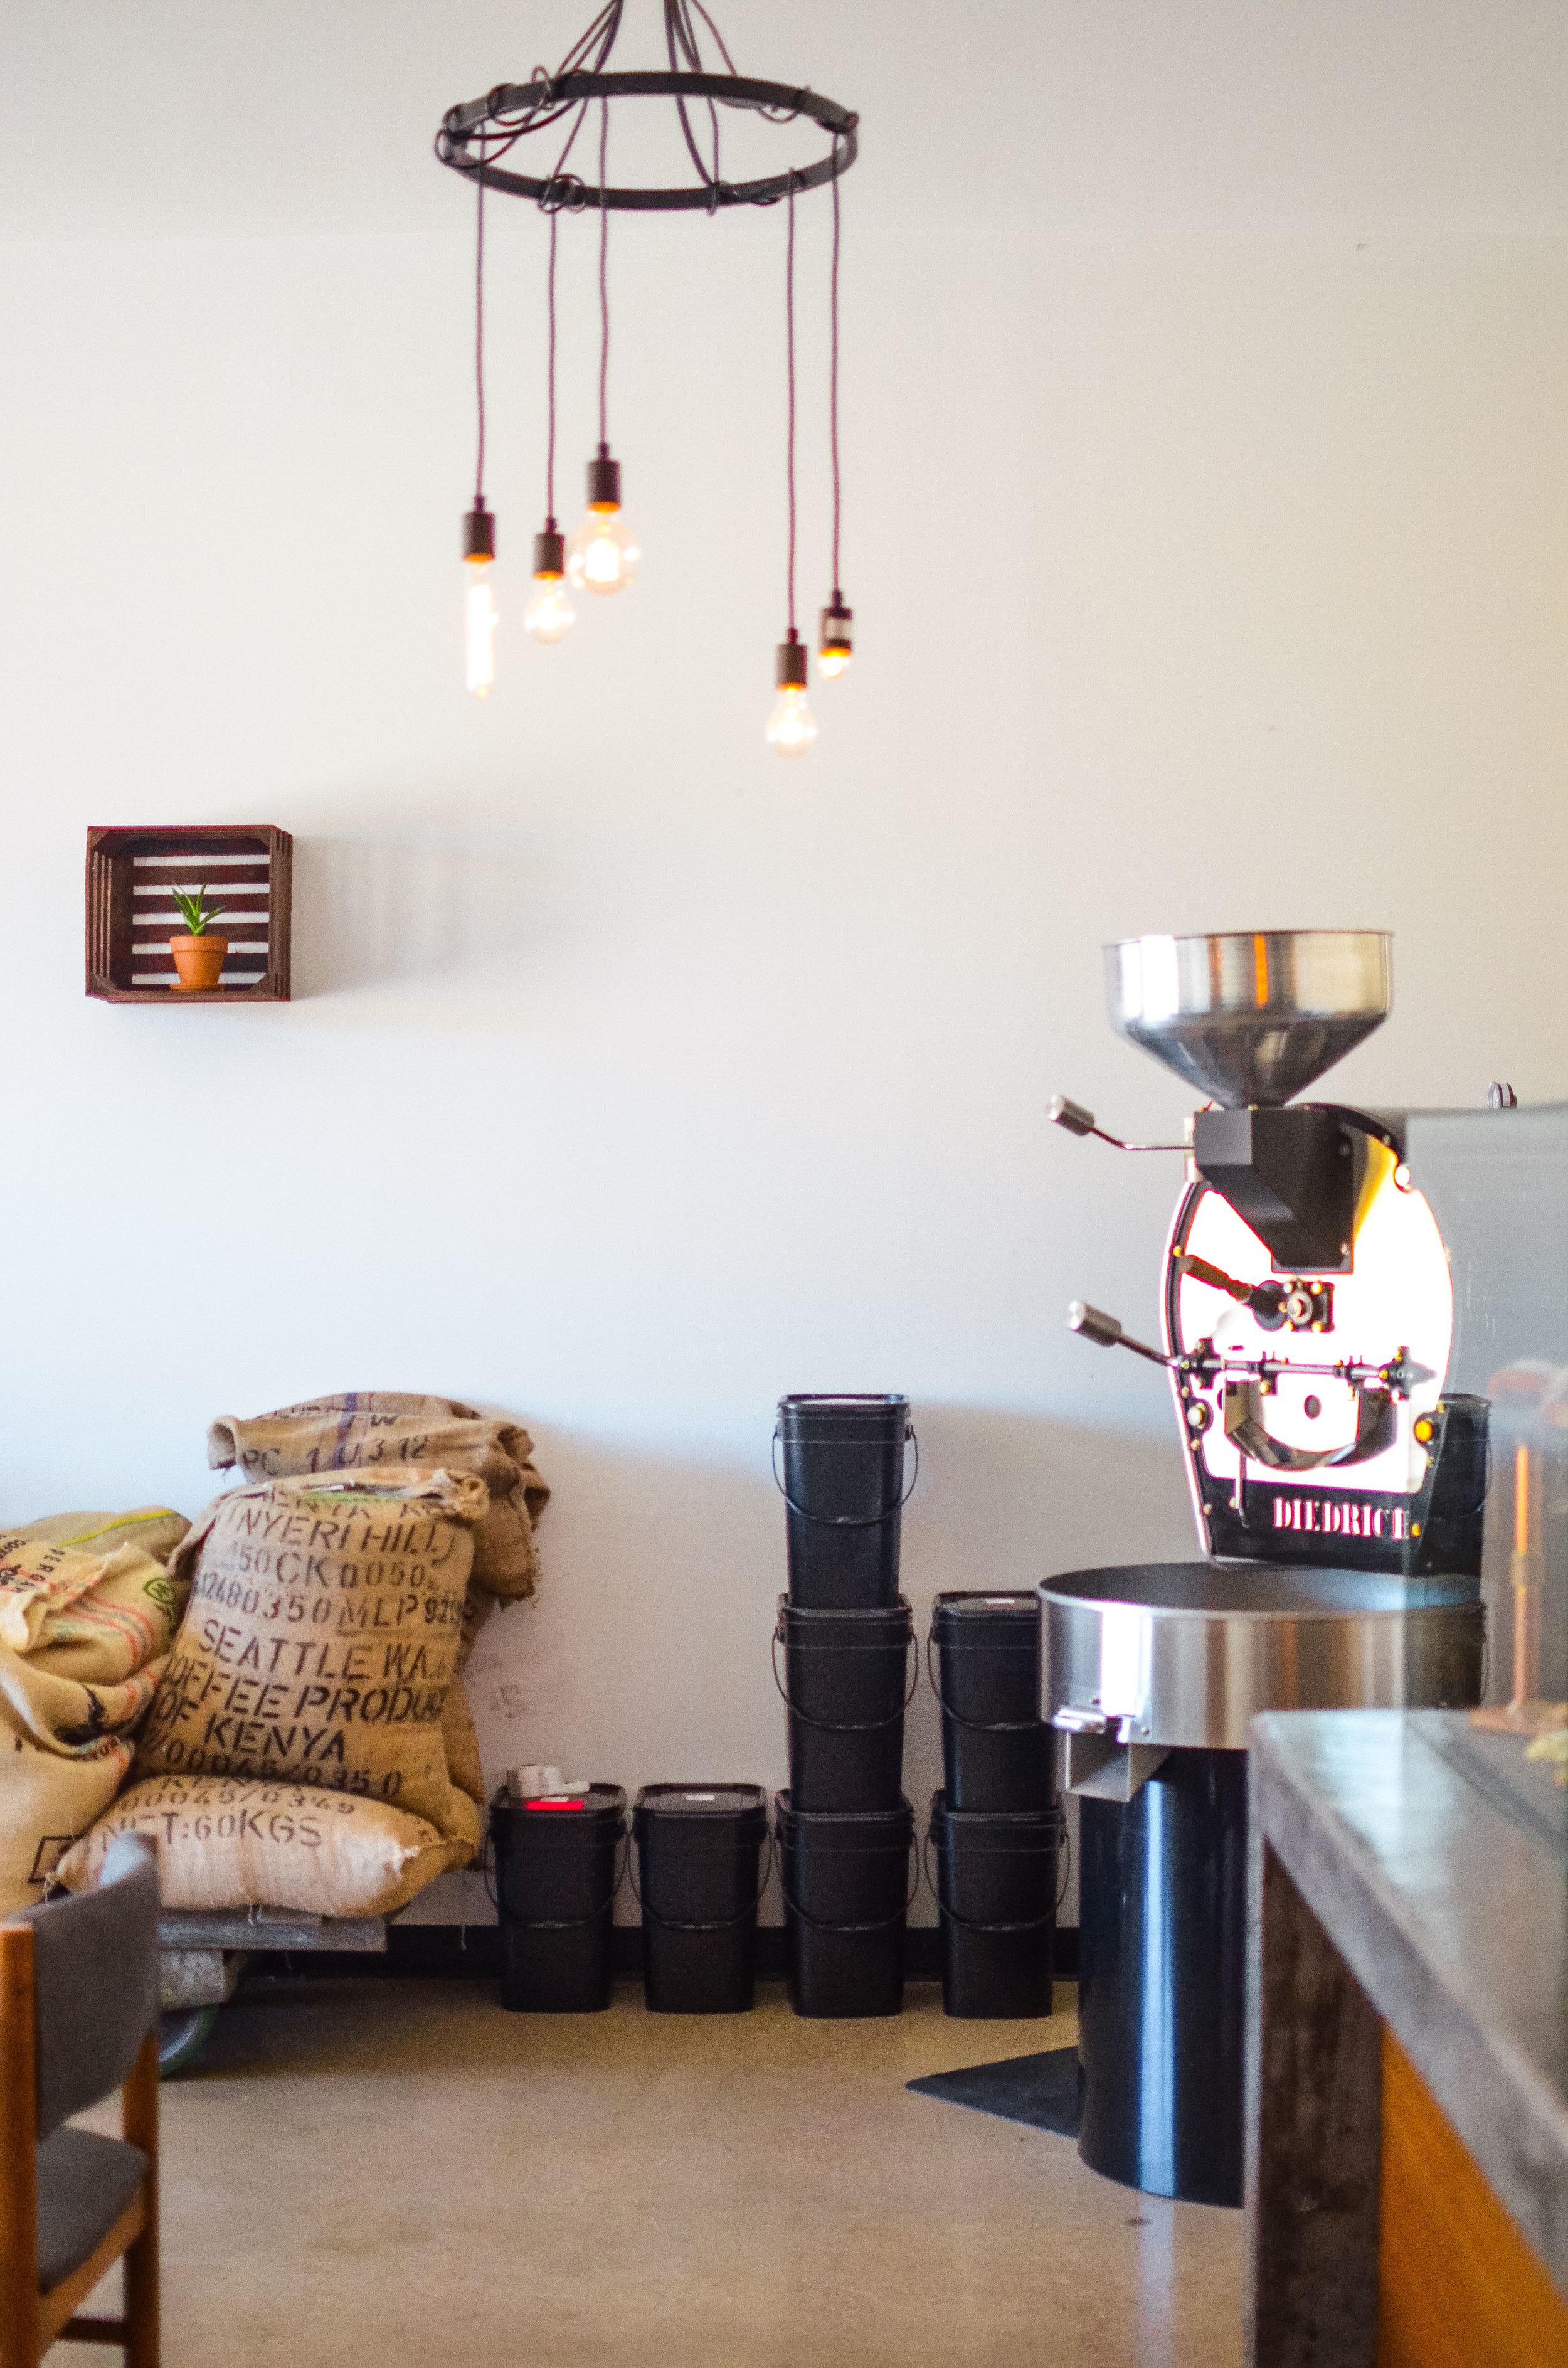 Wendling_Boyd_Mundos_Coffee_Roasters_Traverse_City-15.jpg